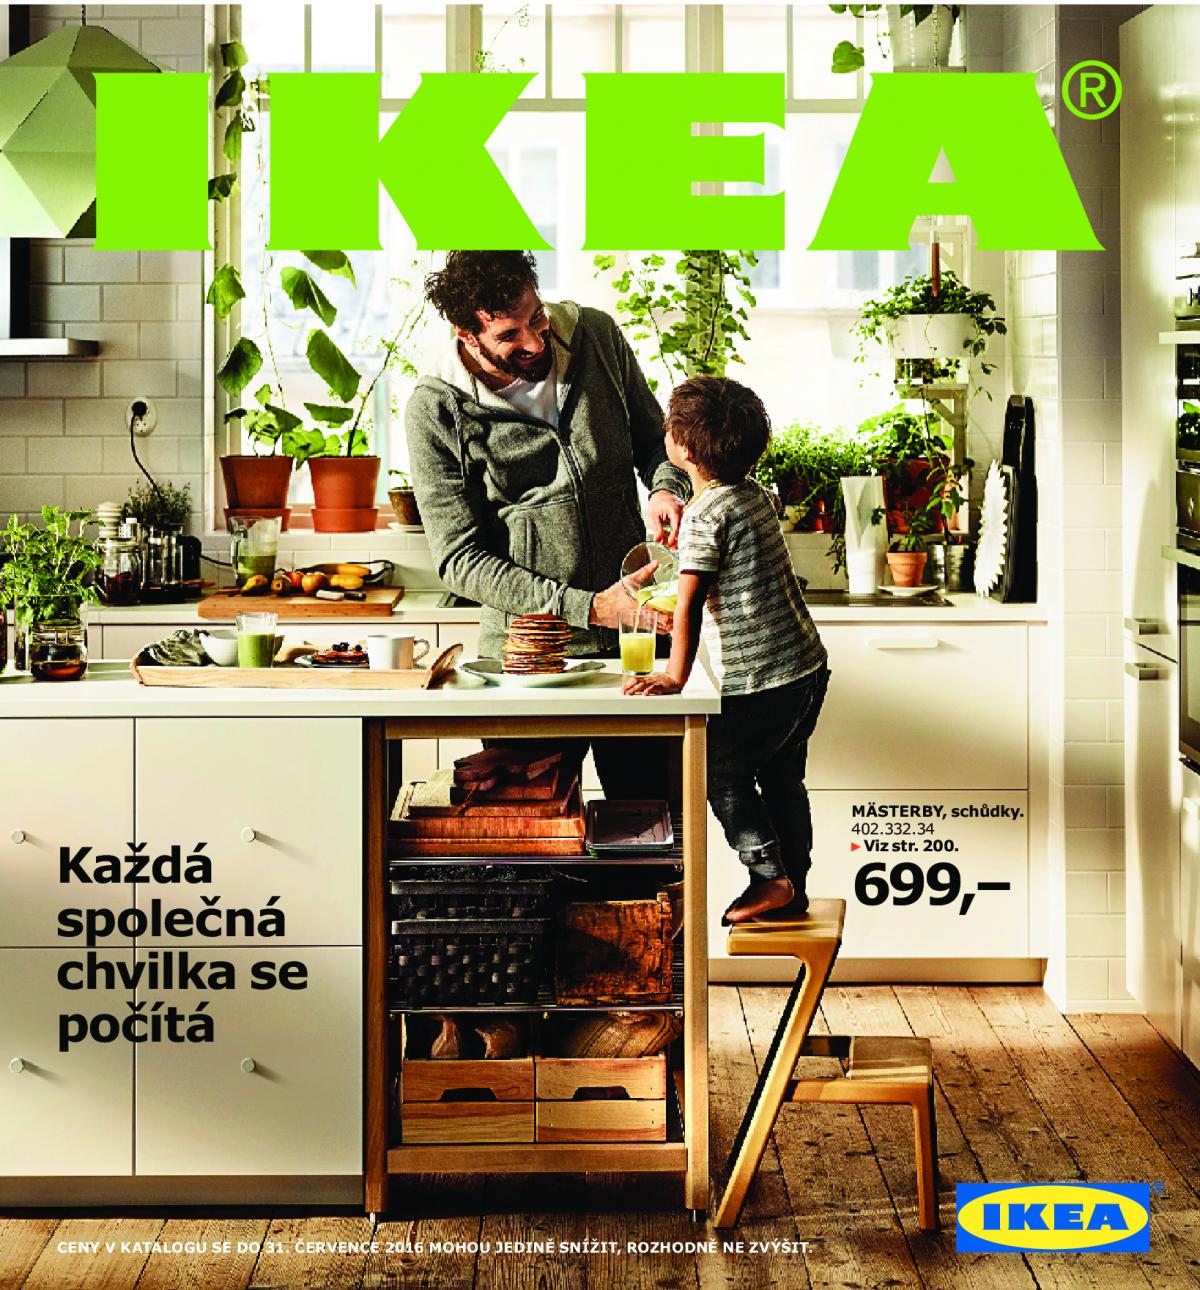 Obálka katalogu z roku 2016